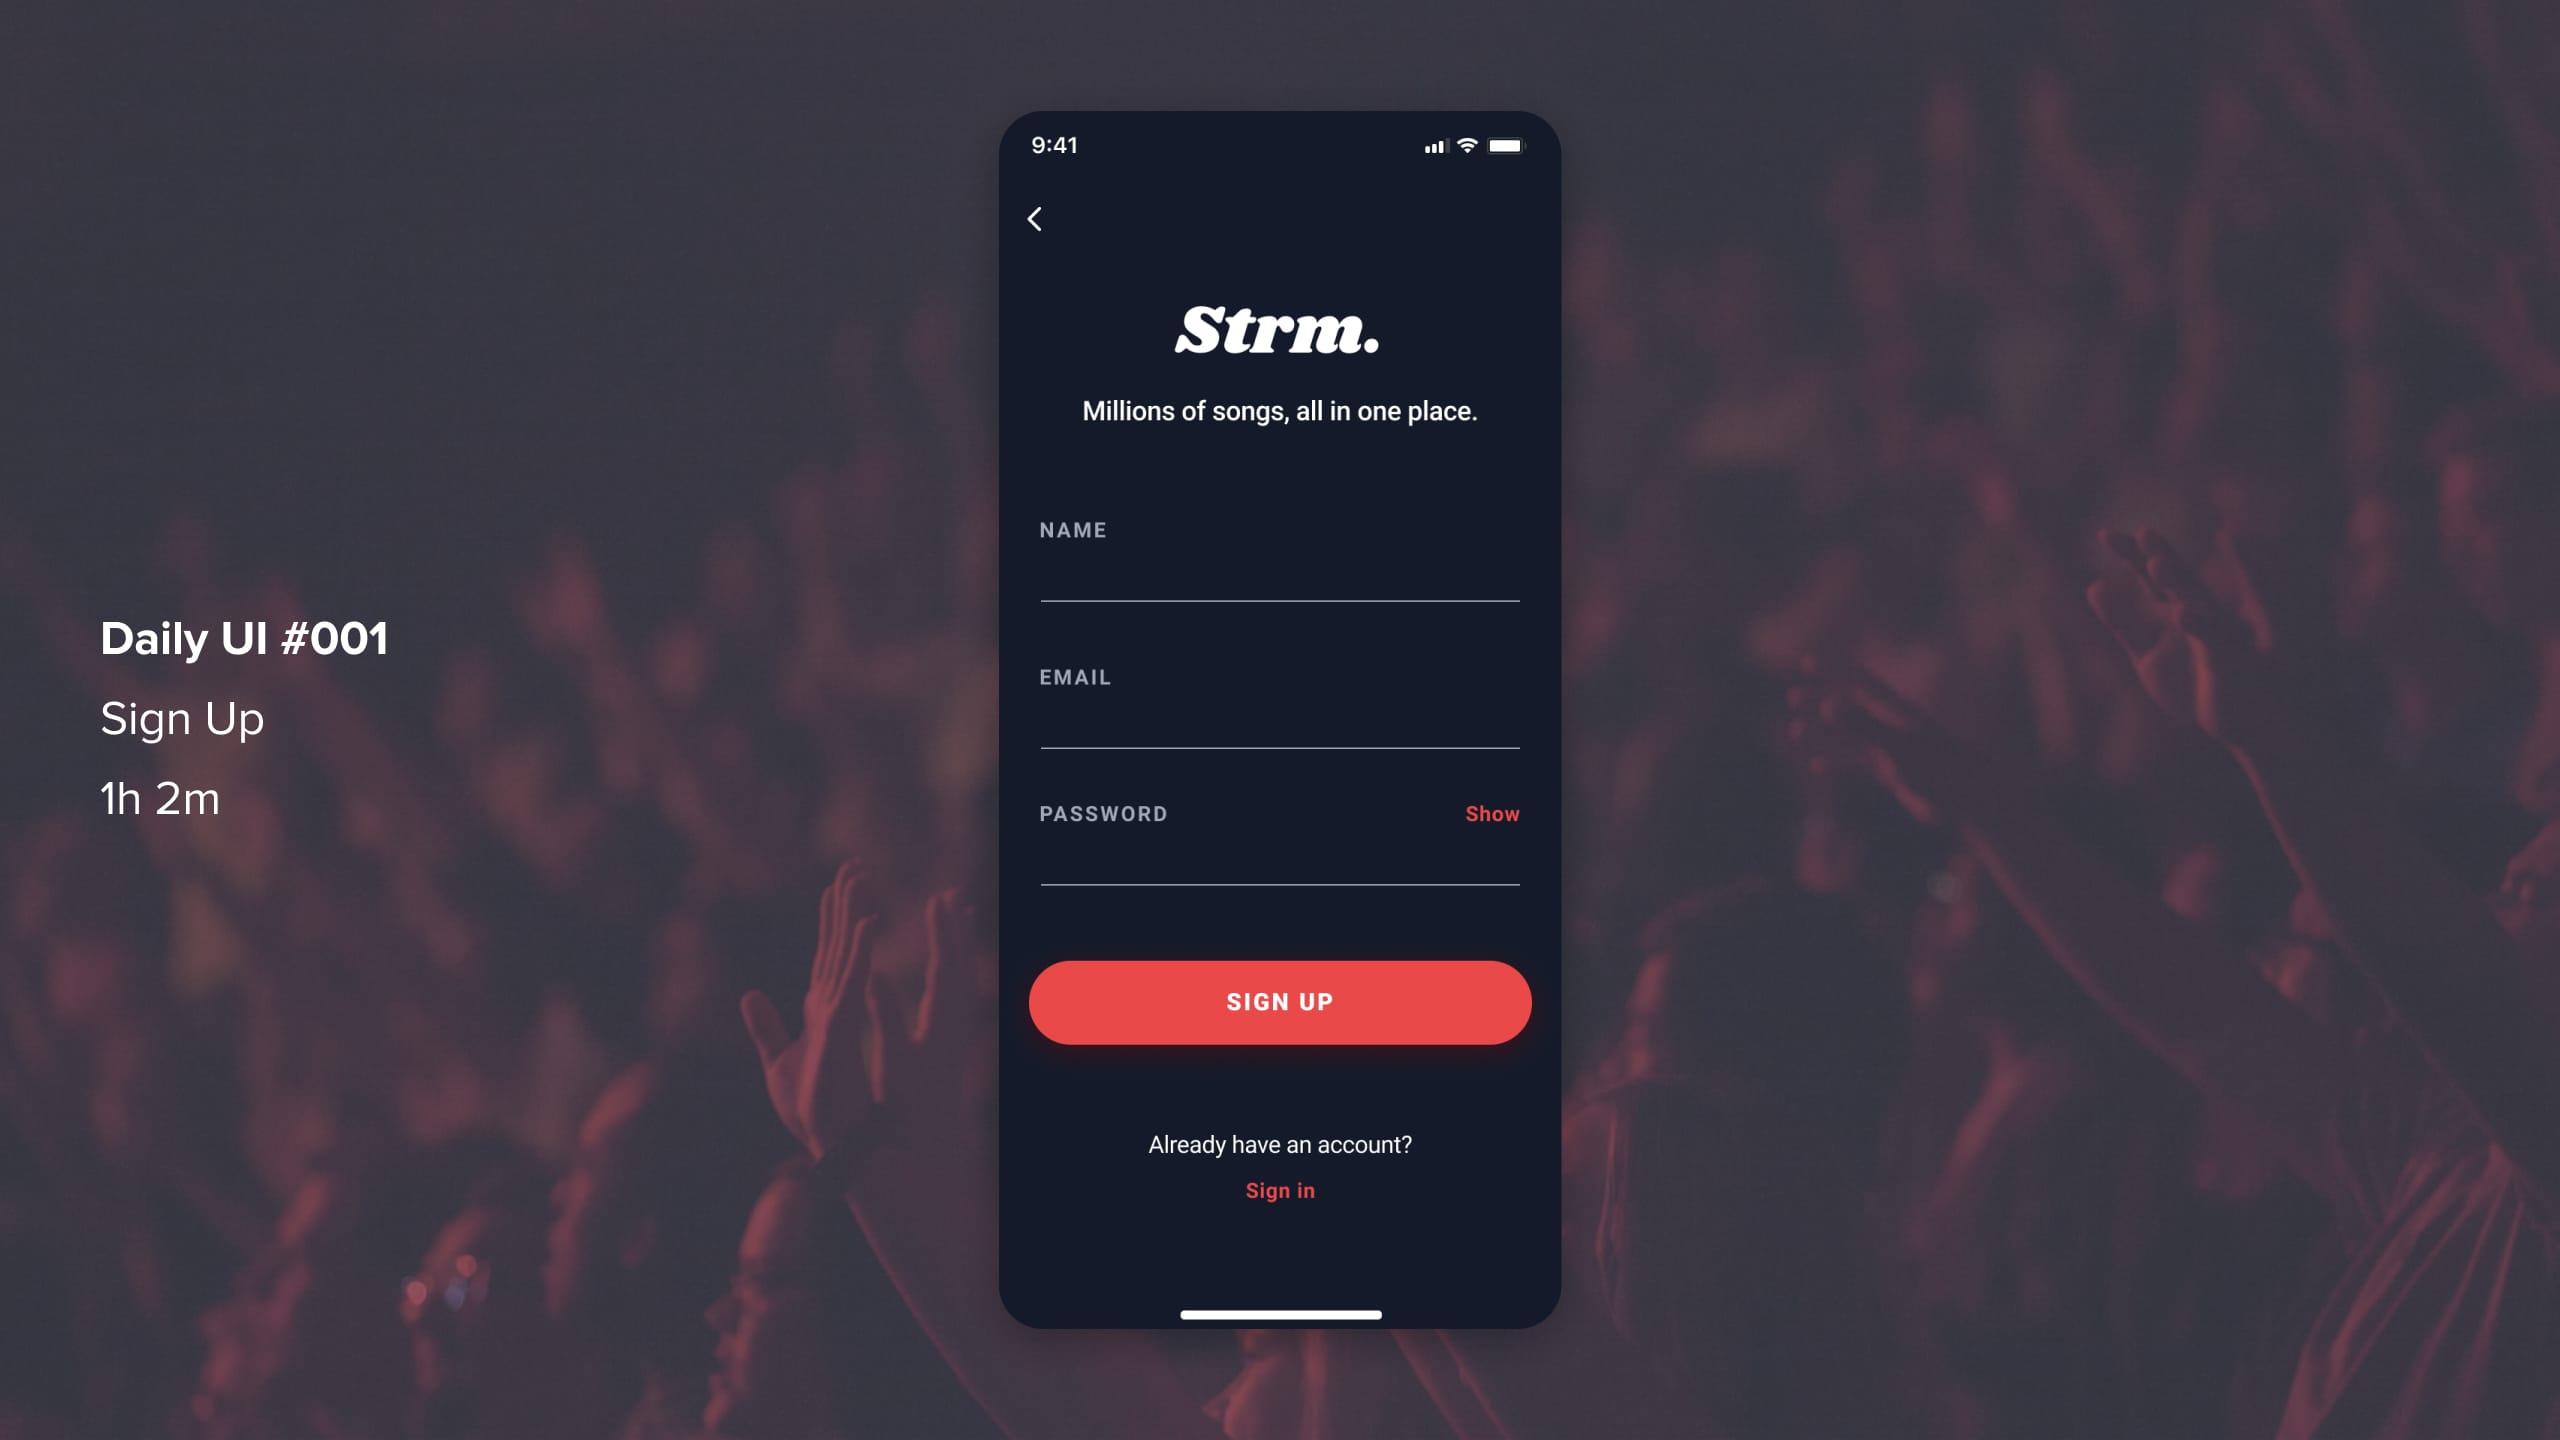 sign up UI